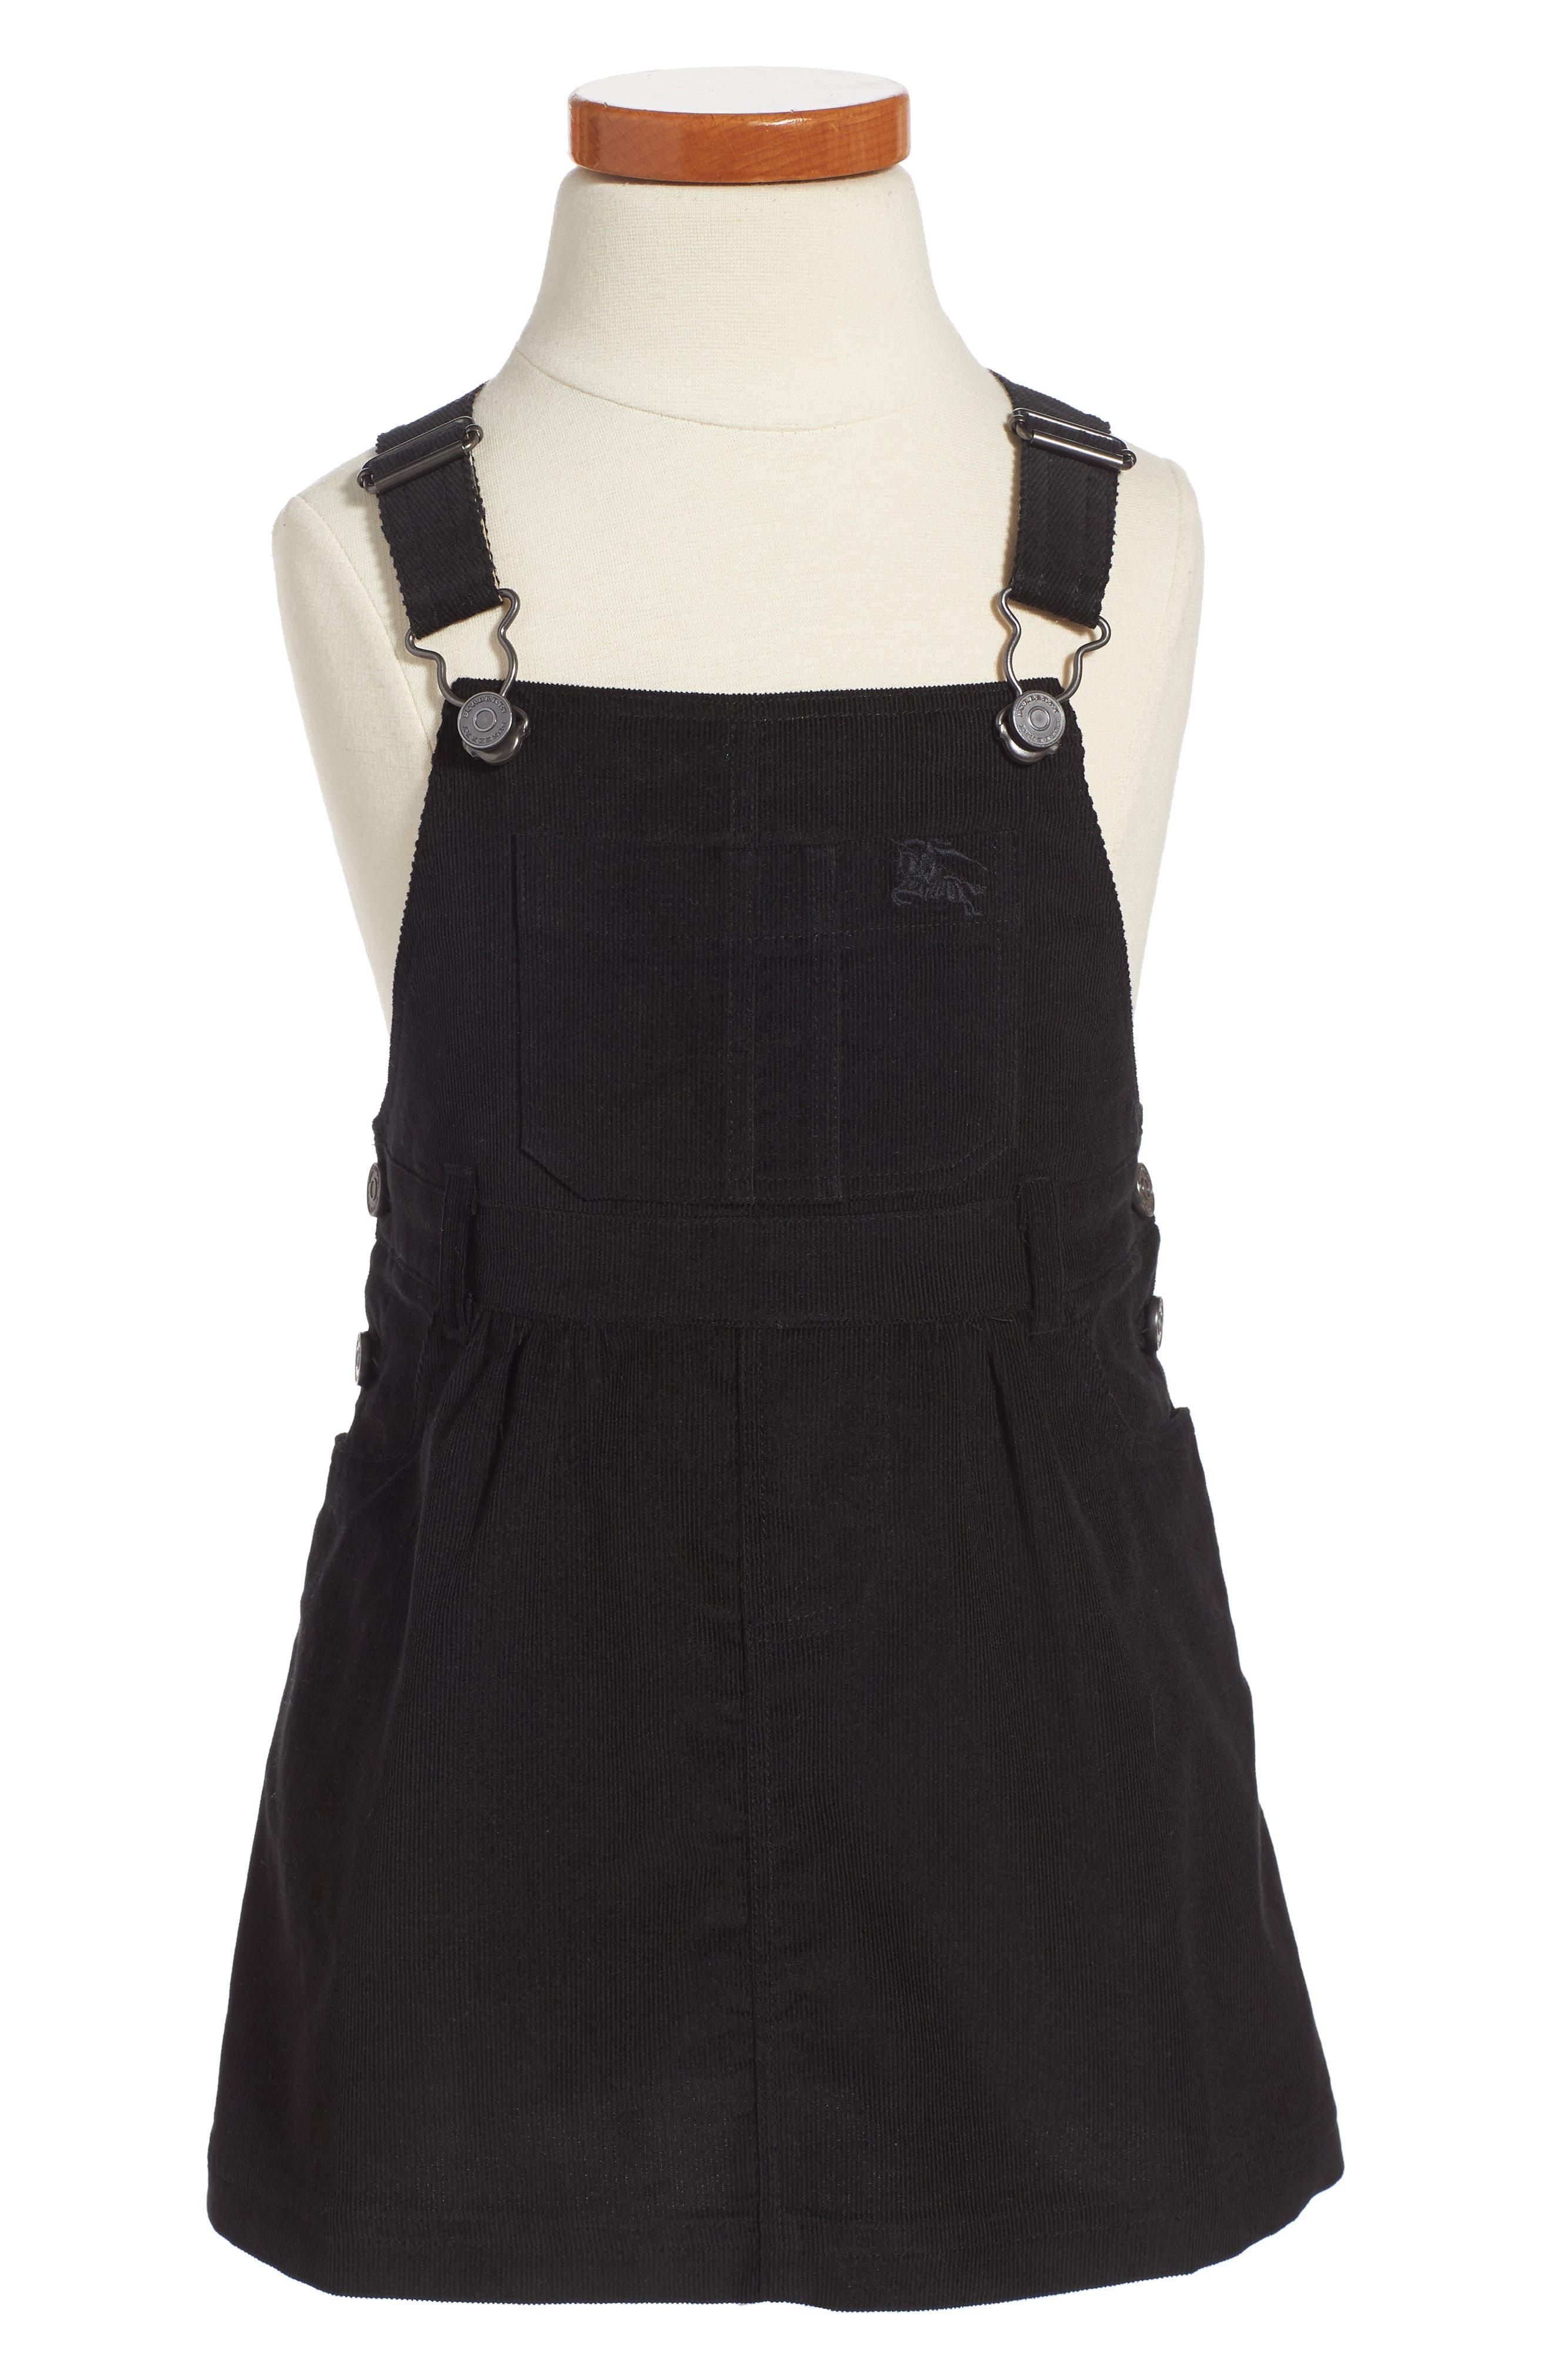 Wilma Overalls Dress,                         Main,                         color, Black